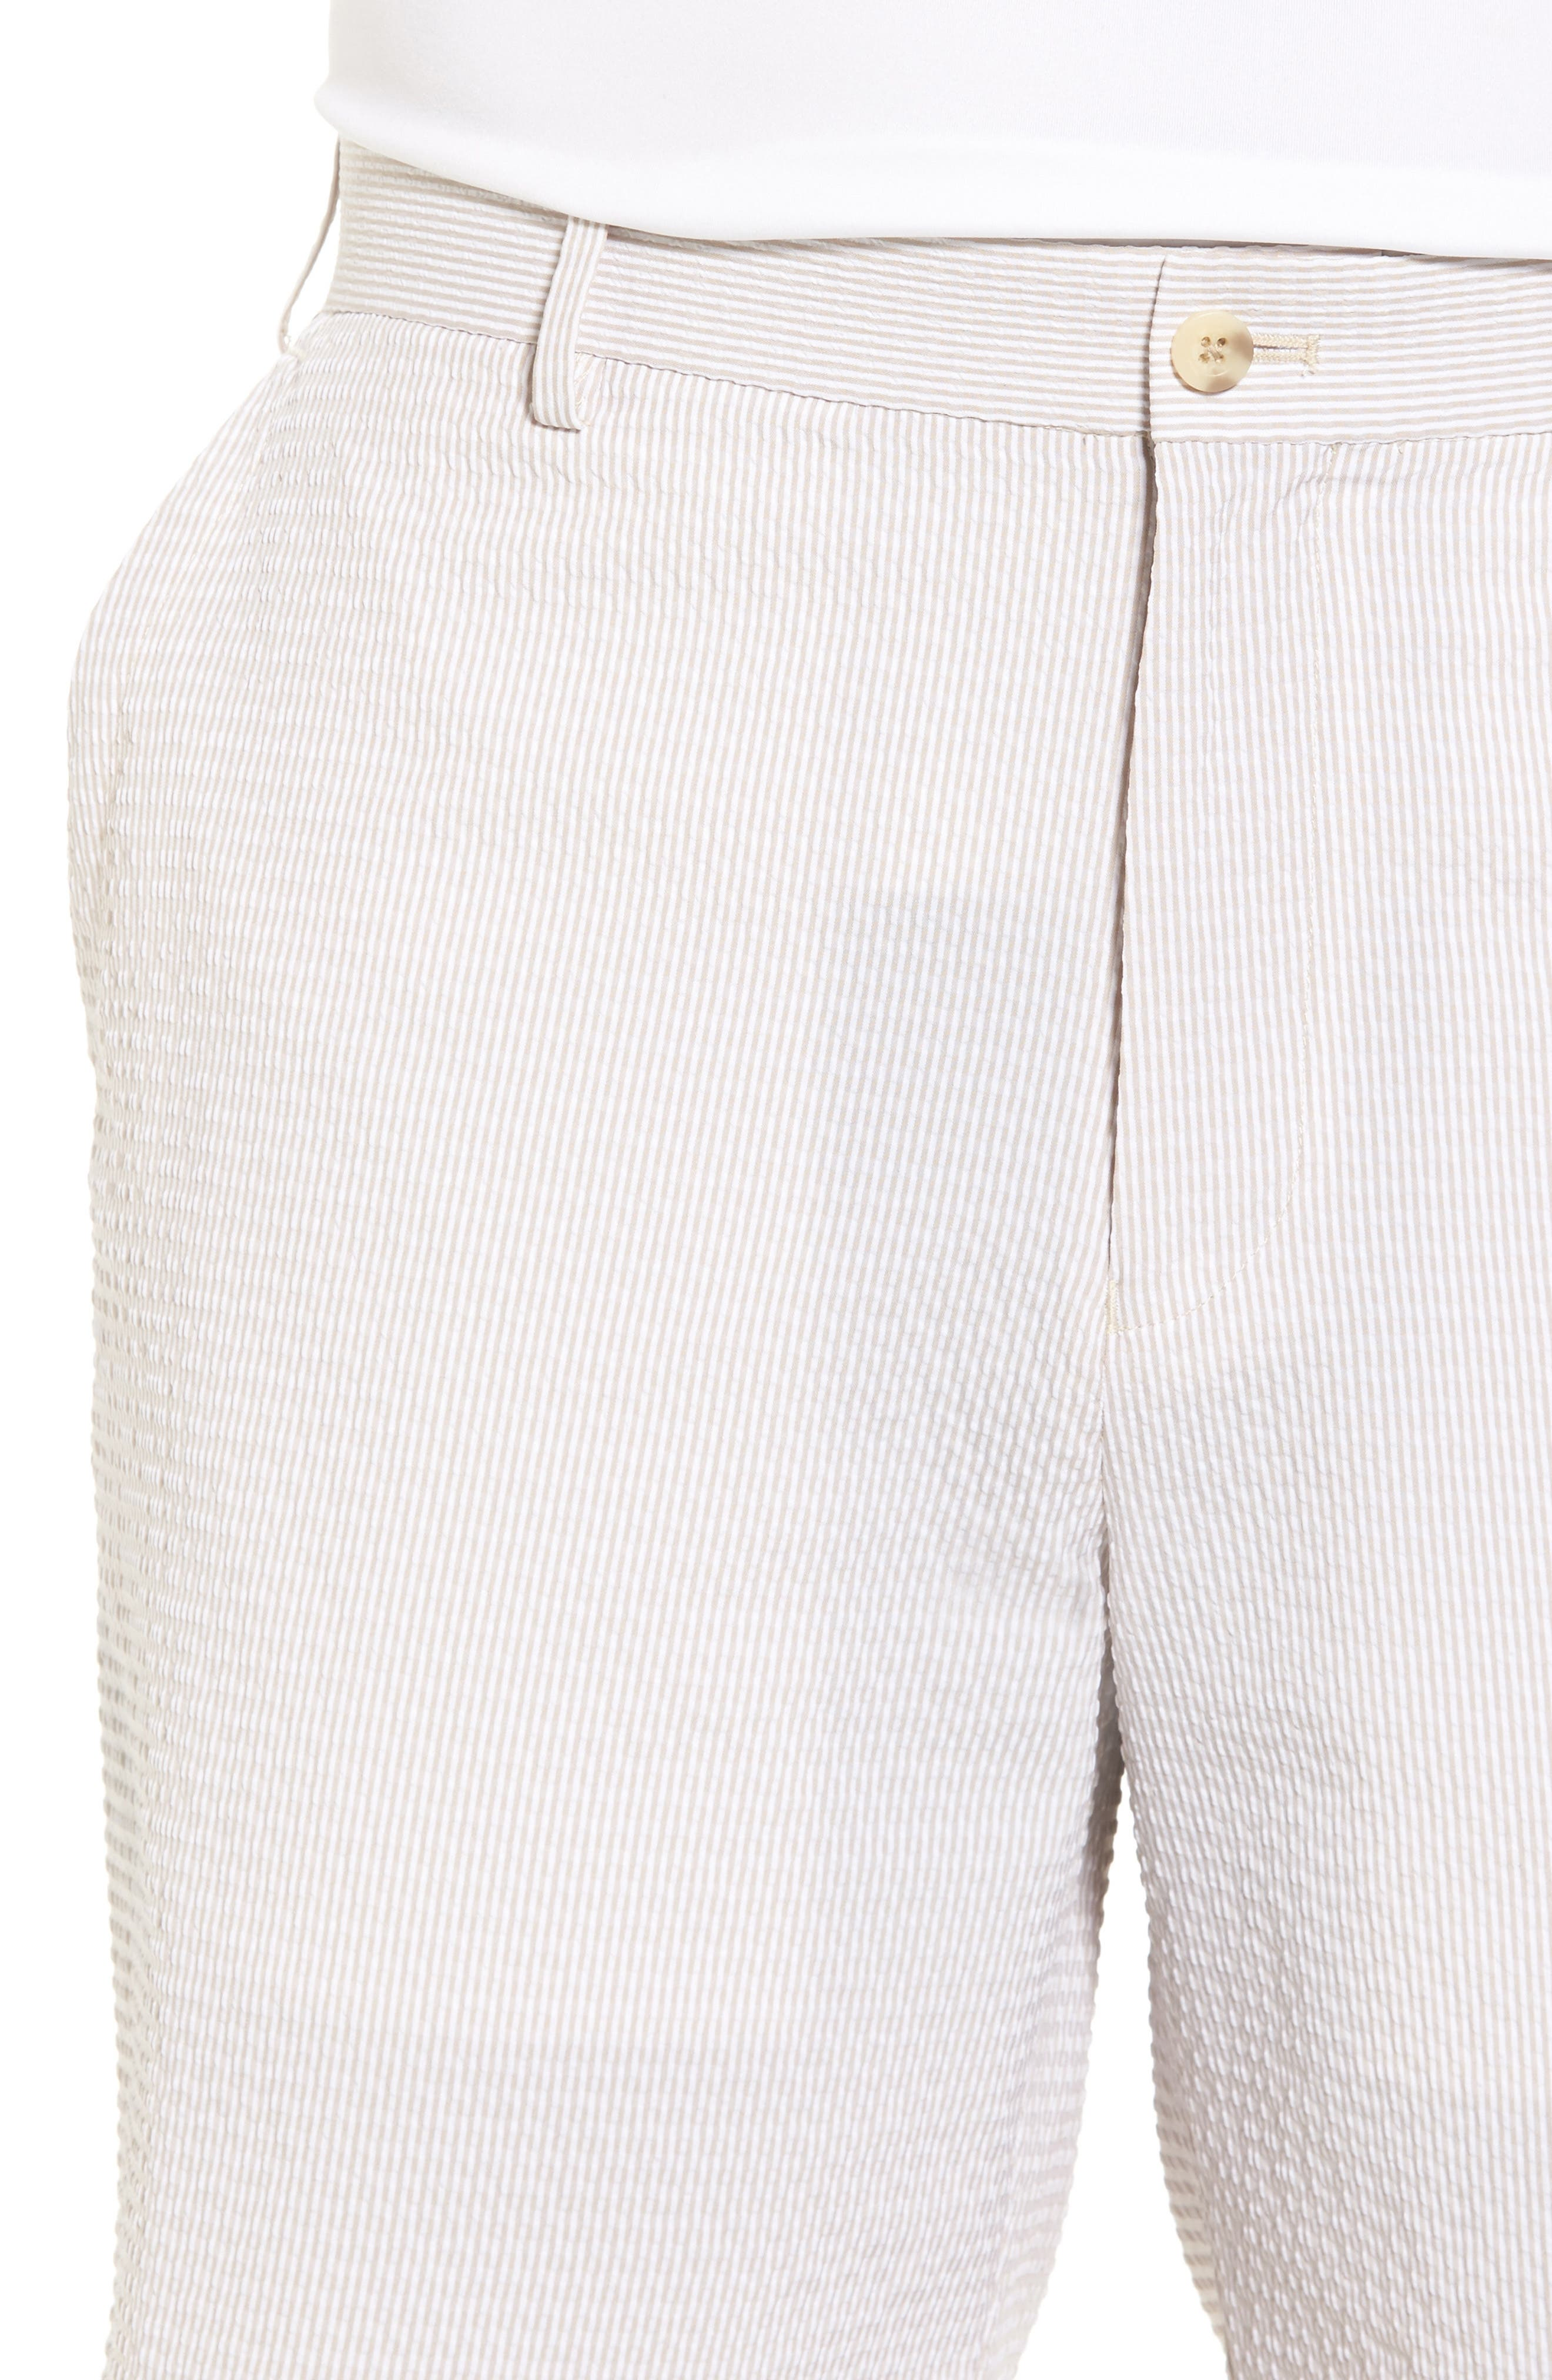 Apex Pinstripe Seersucker Shorts,                             Alternate thumbnail 4, color,                             Khaki